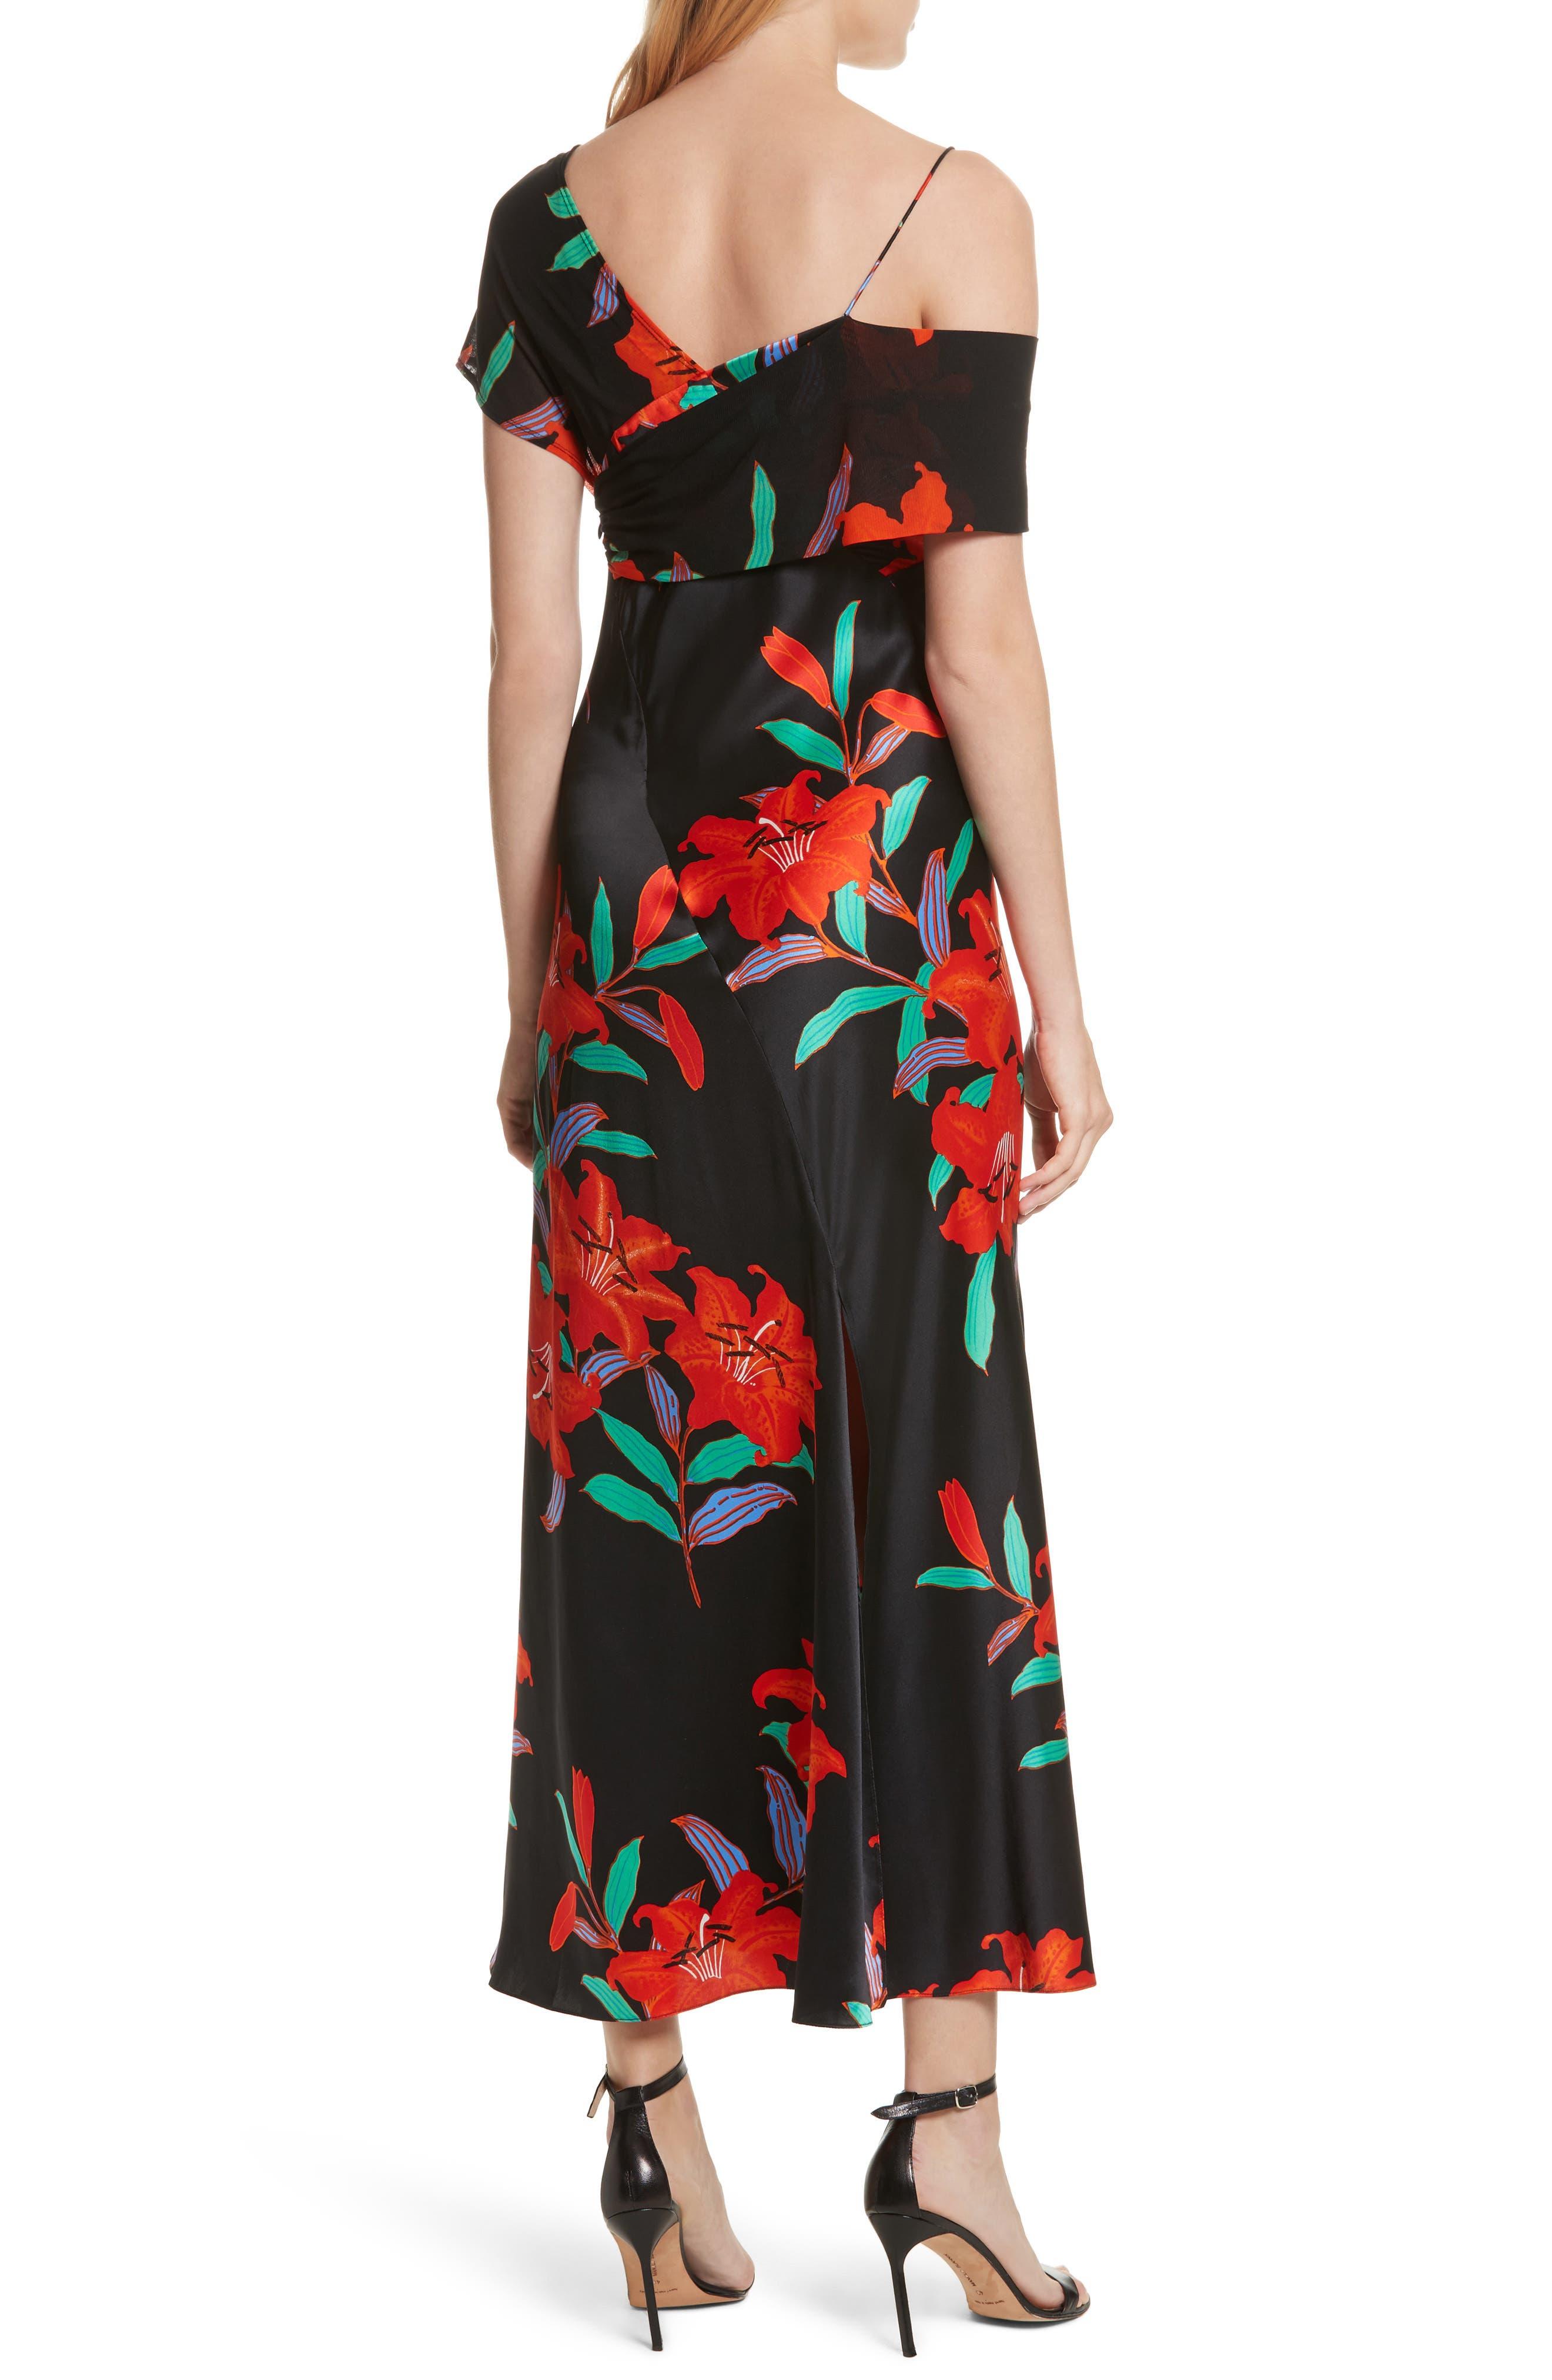 Diane von Furstenberg Asymmetrical Knotted Gown,                             Alternate thumbnail 2, color,                             001